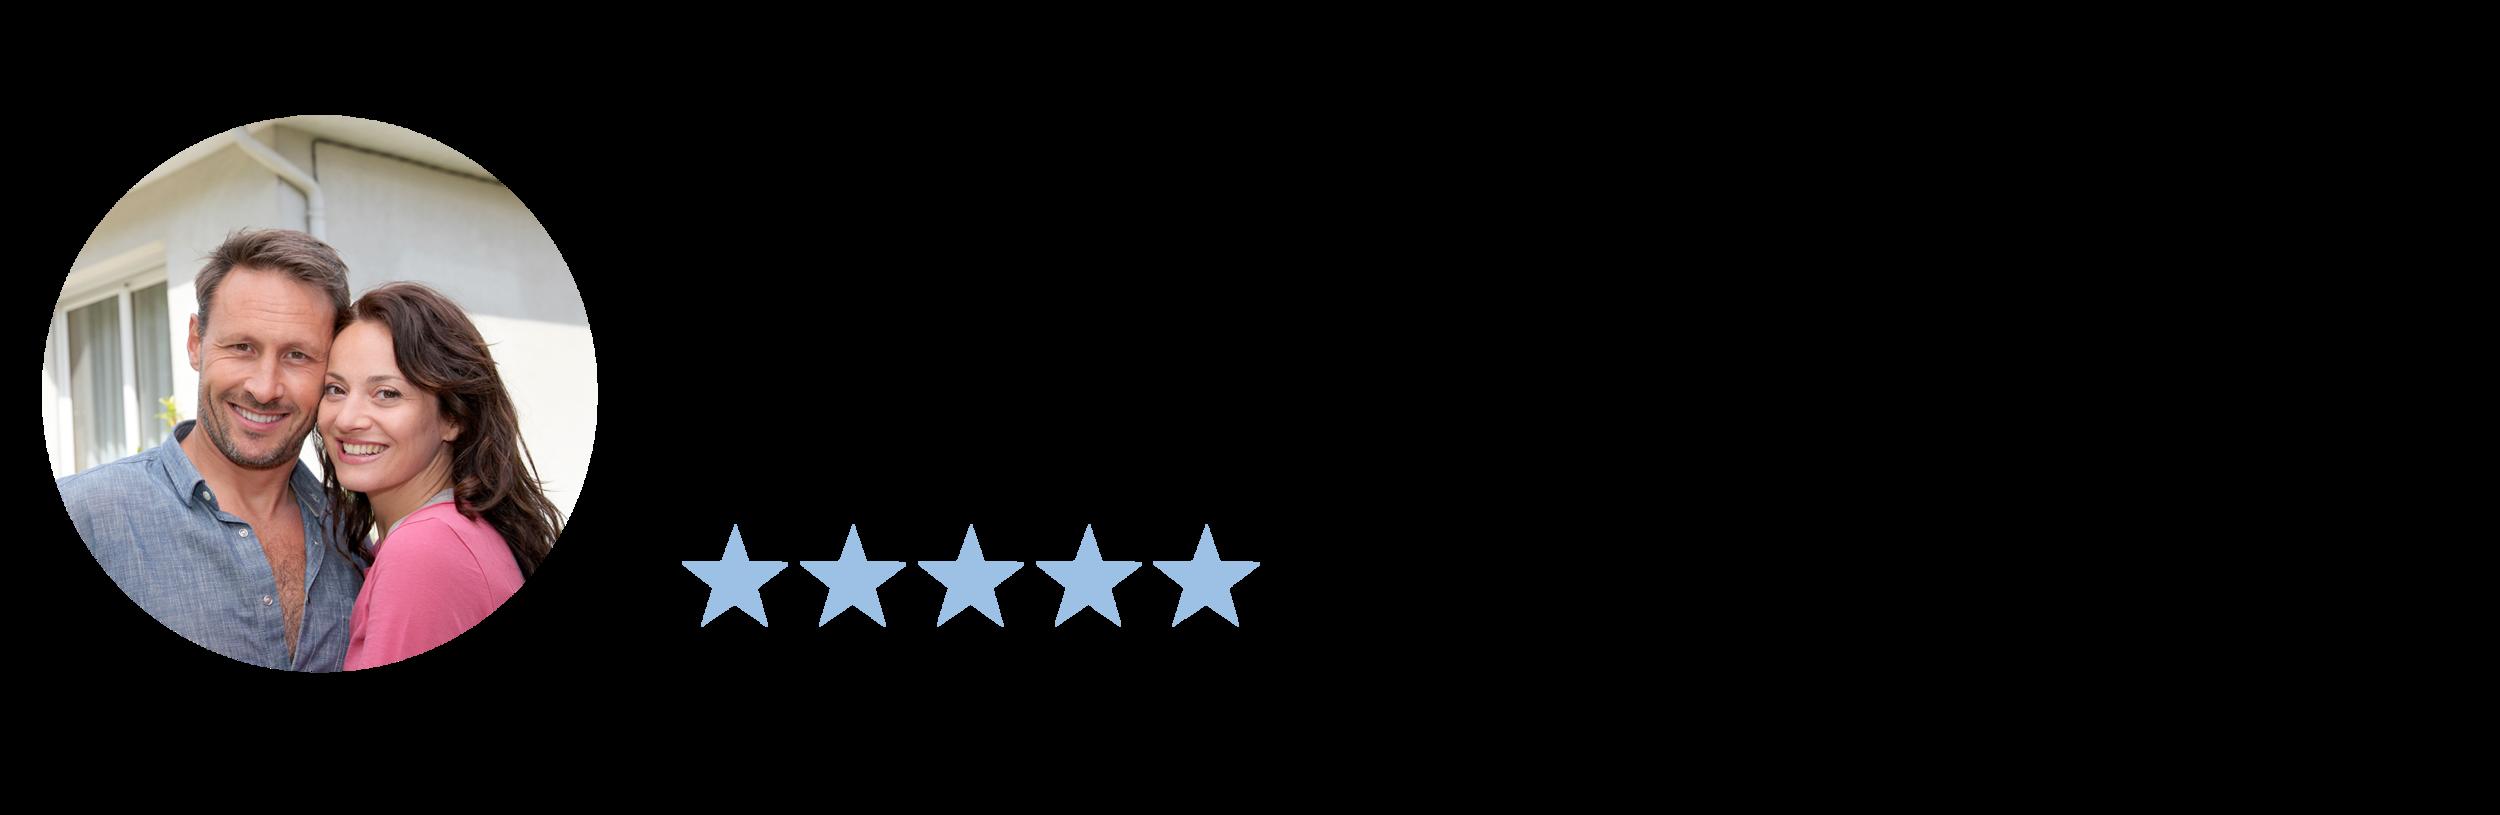 Reviews5.png